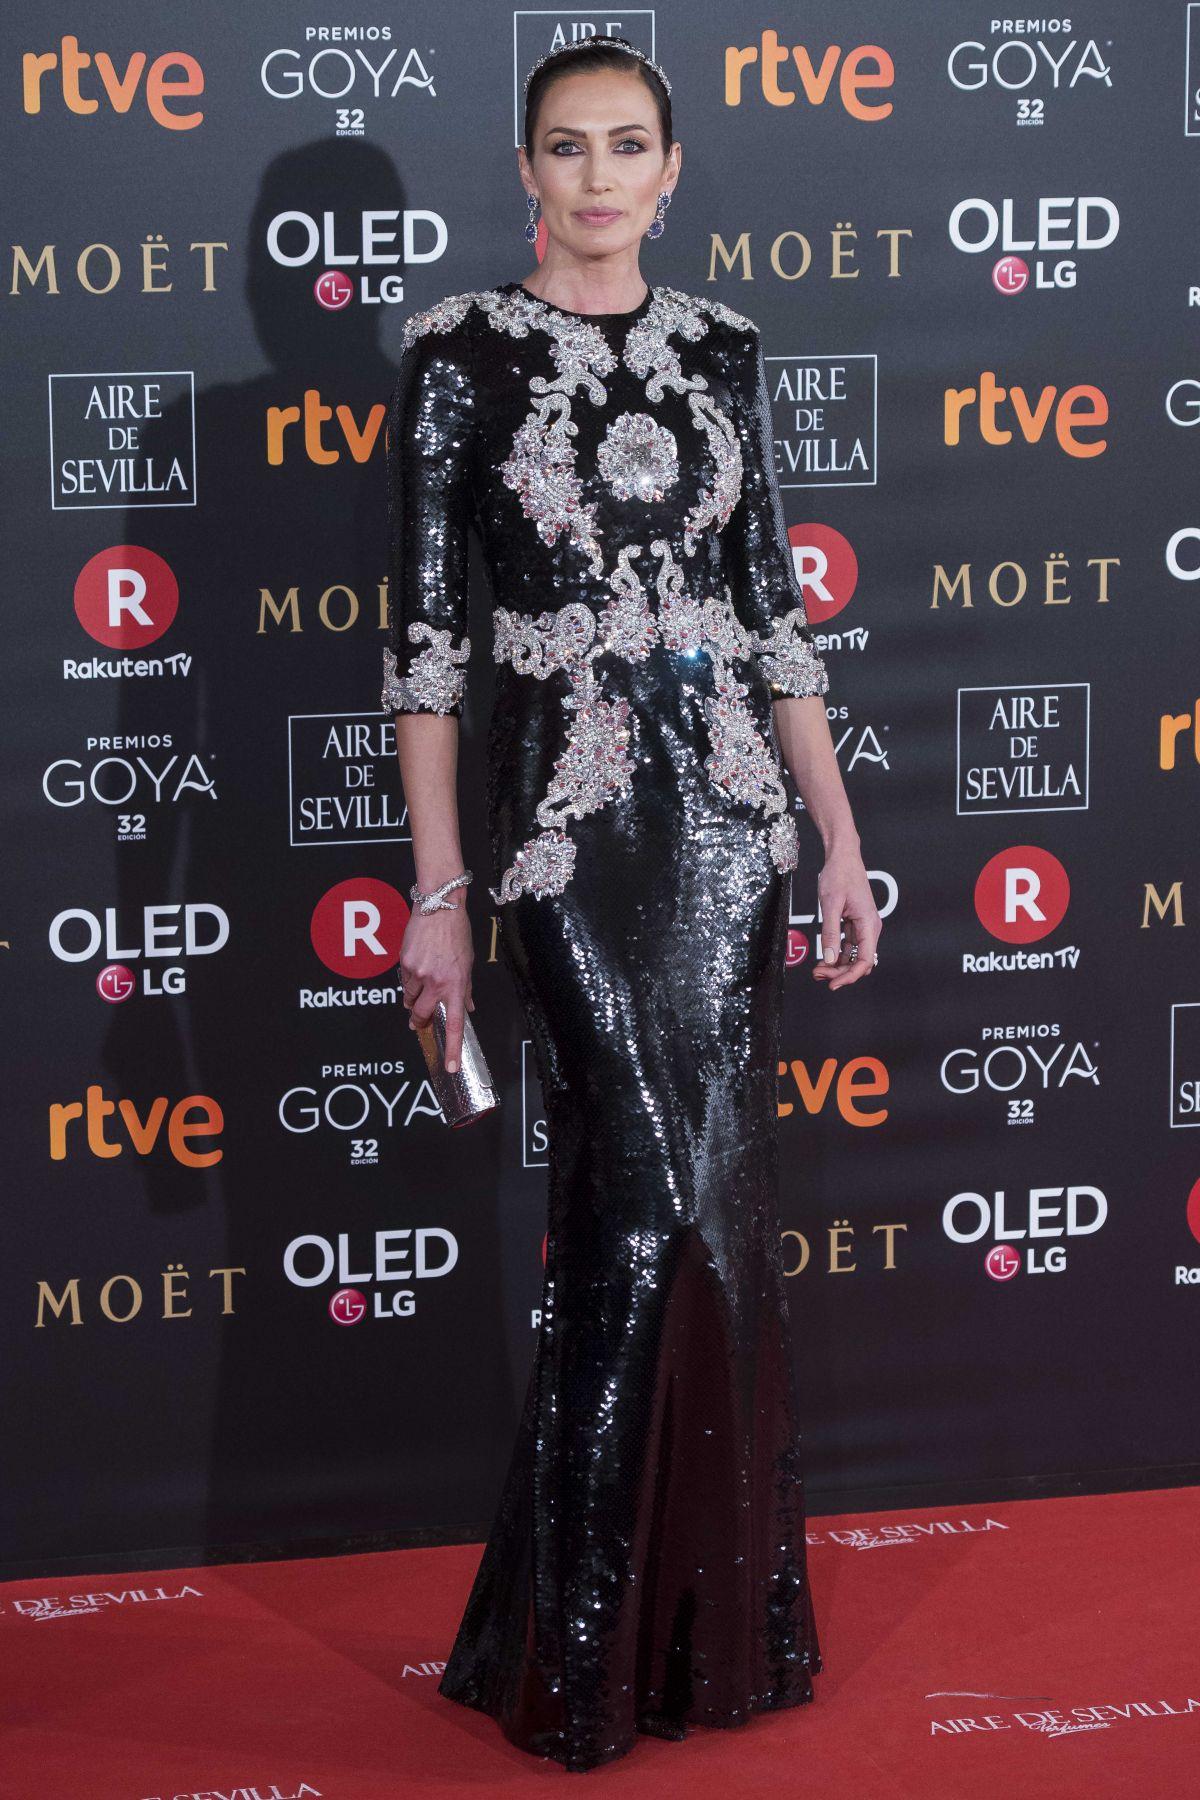 photo Nieves alvarez goya cinema awards at the marriott auditorium in madrid